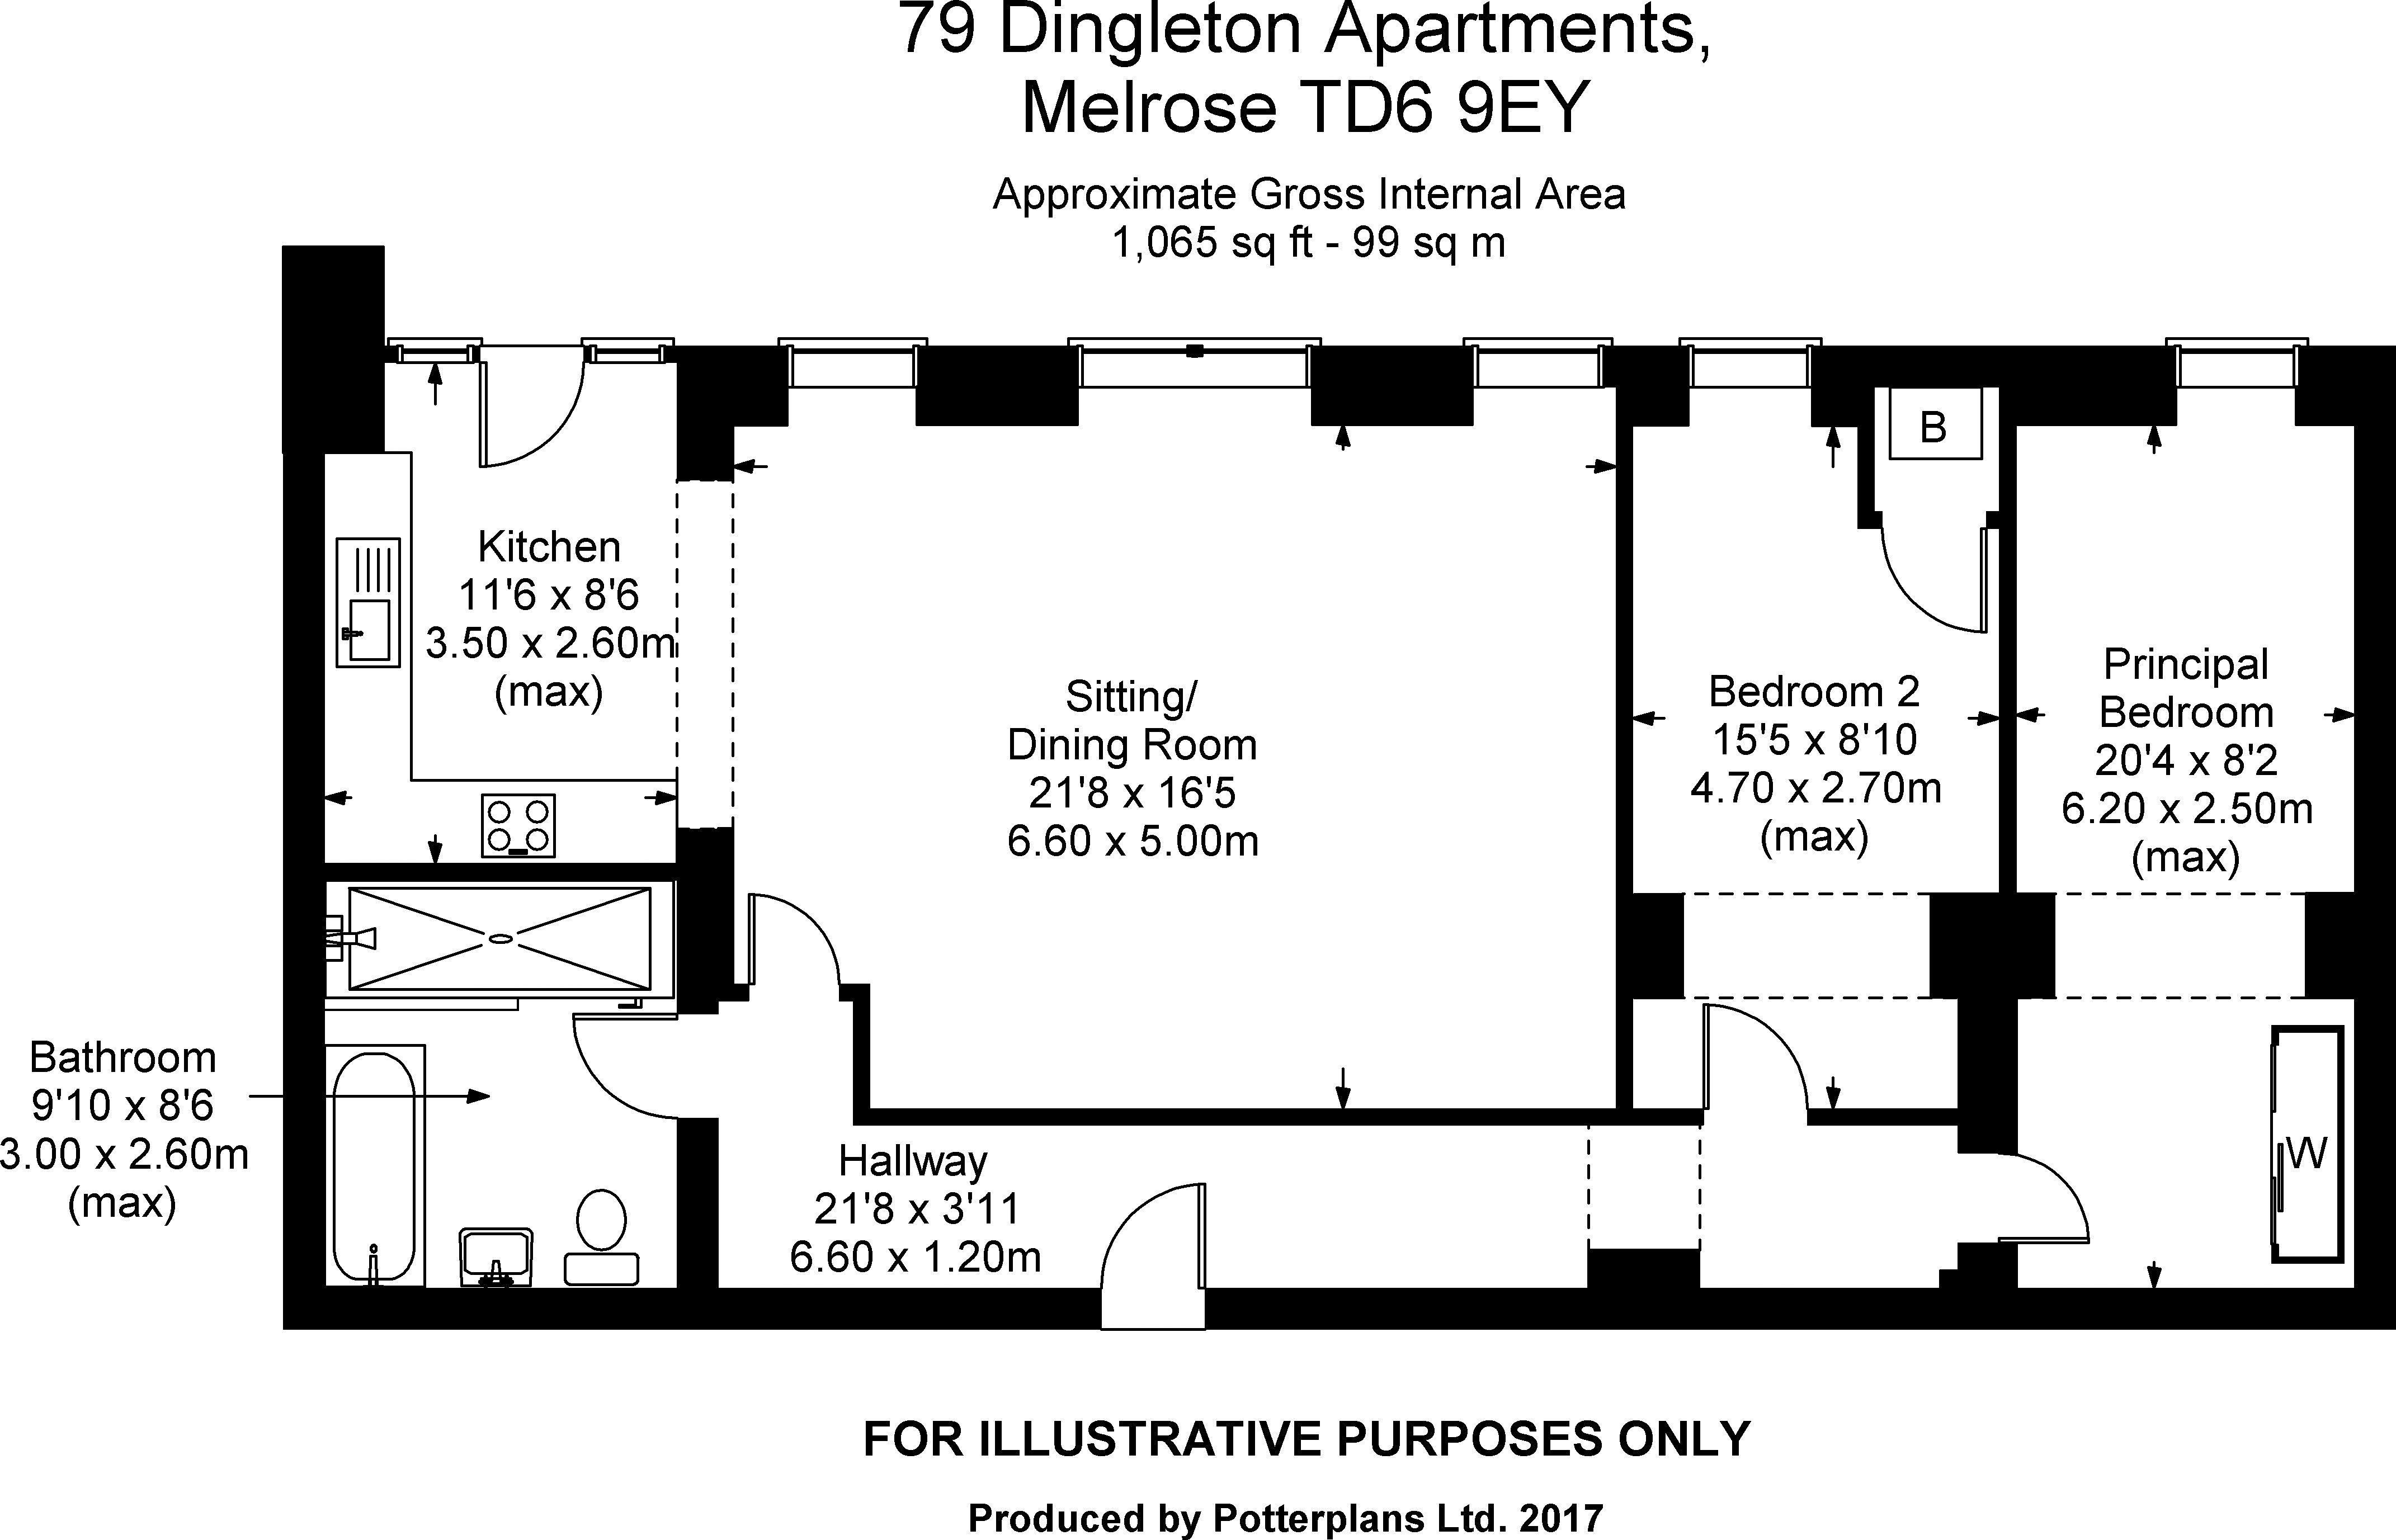 79 Dingleton Apartments Floorplan